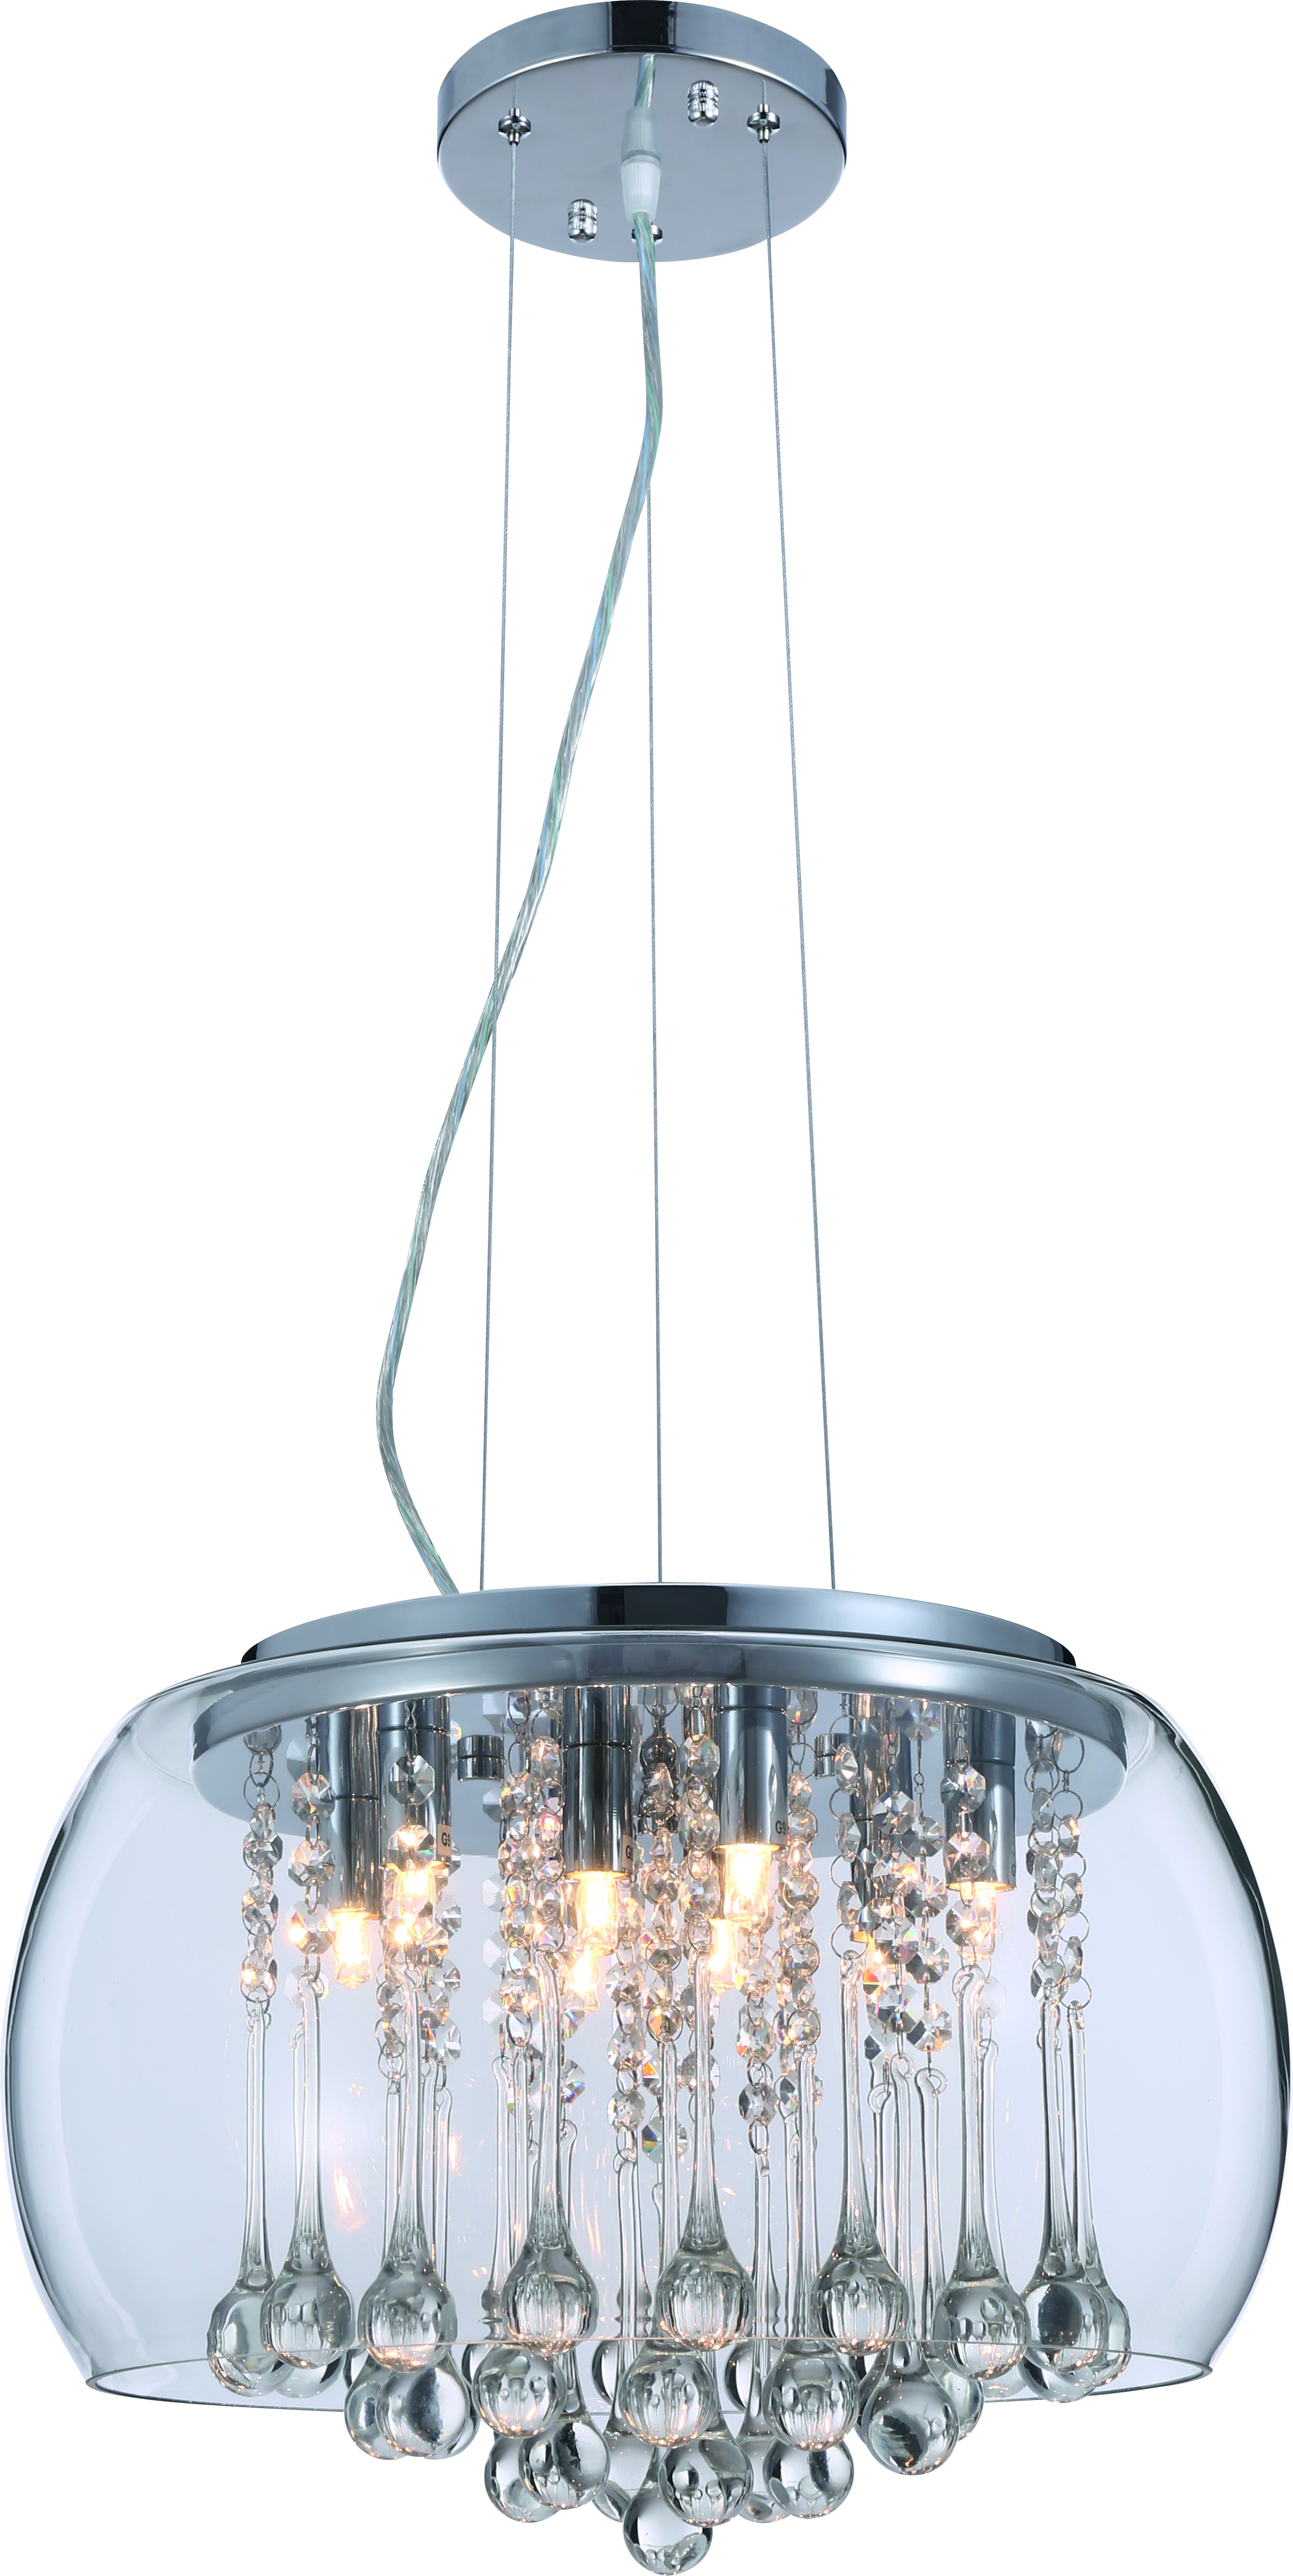 Люстра Arte lamp A7054sp-8cc люстра на штанге arte lamp arancia a9276lm 8cc